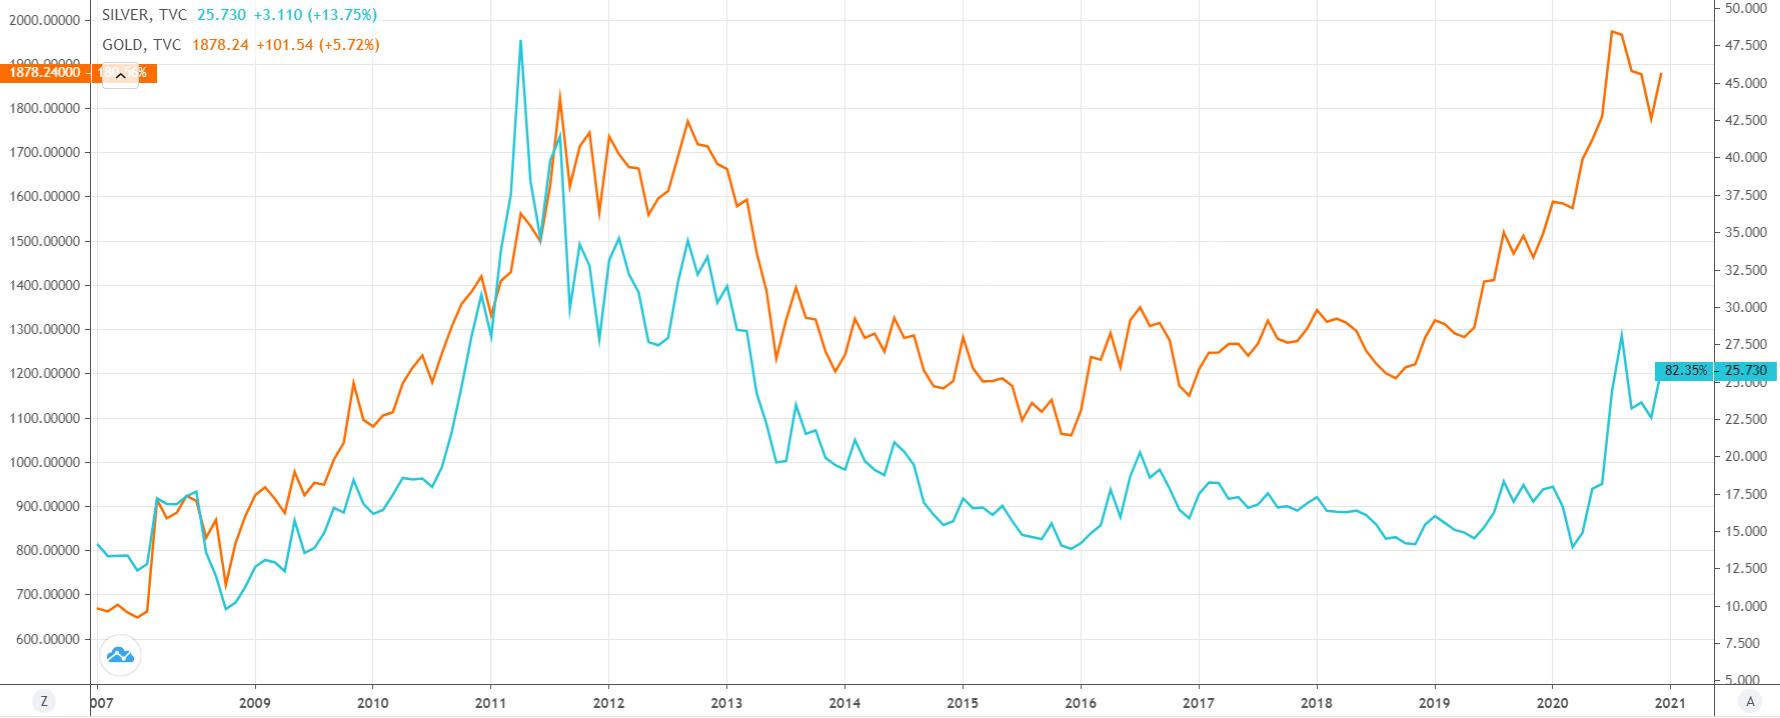 Gold vs silver chart